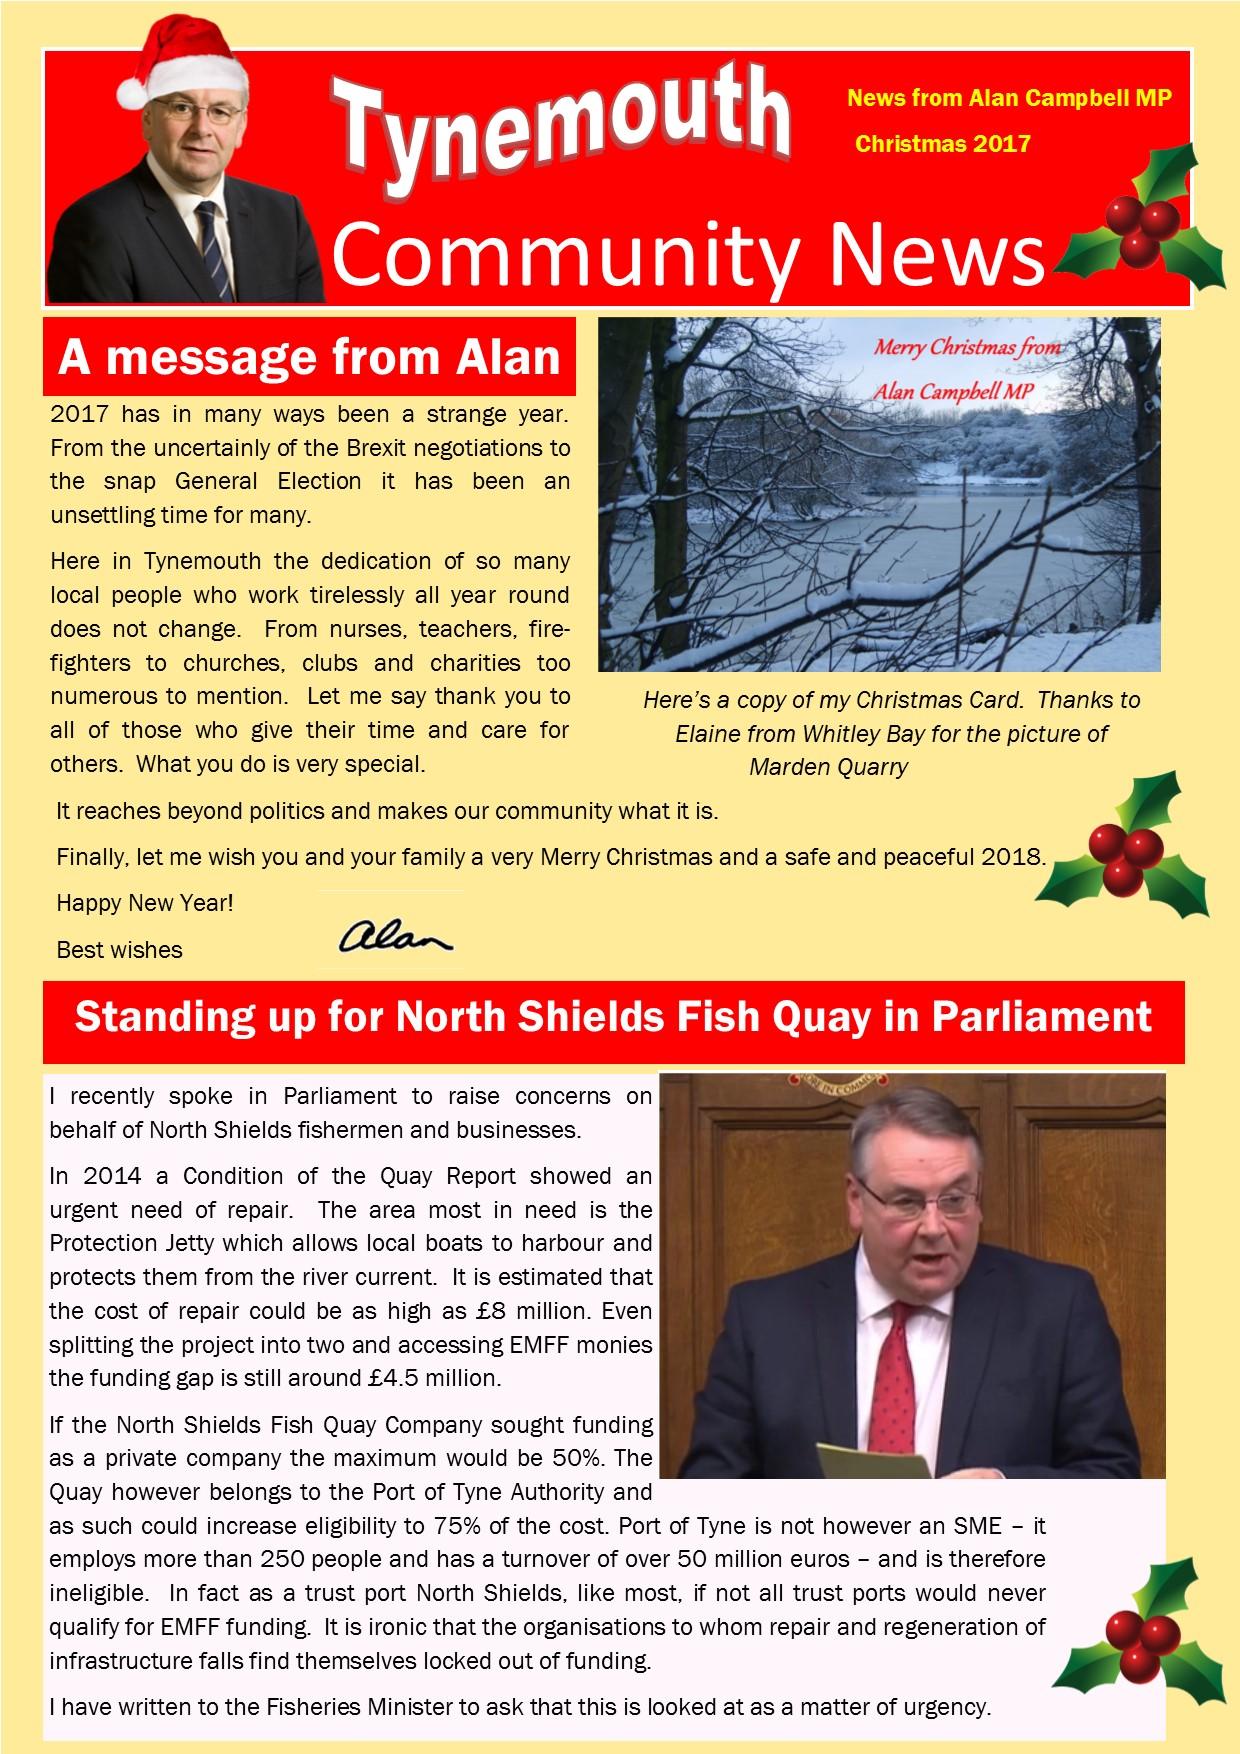 Alan_Campbell_MP_-_Christmas_Community_News_-_Dec_2017.jpg